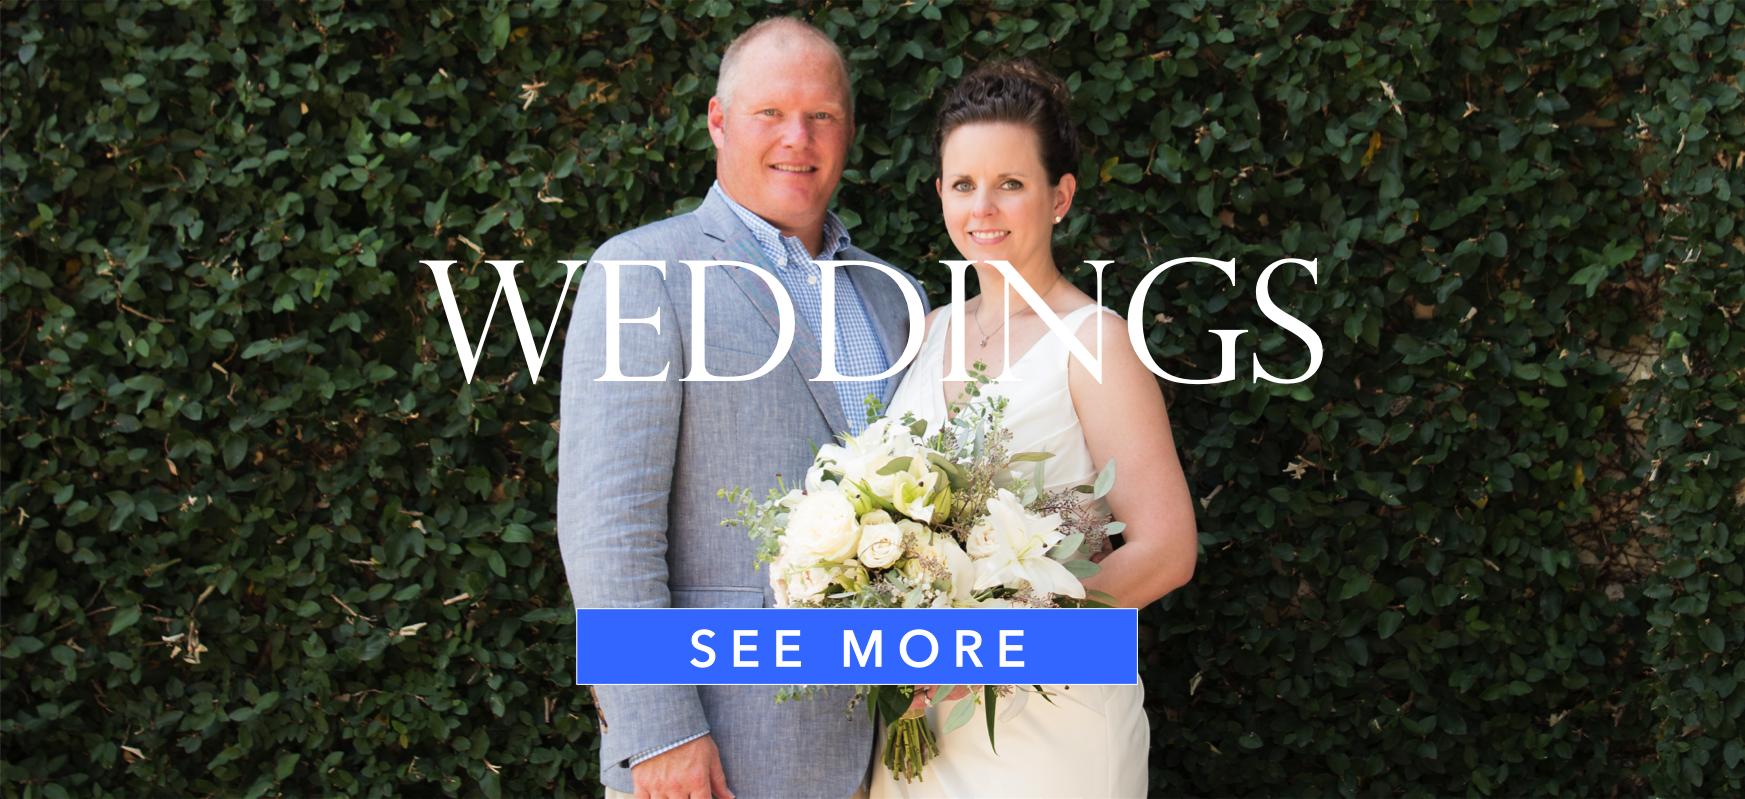 el-paso-weddings-bodas-79912-iconic-gifts-angies-floral-designs-el-paso-texas-79912-el-paso-flowershop-angies-flower-florist-79912-best-florist.png